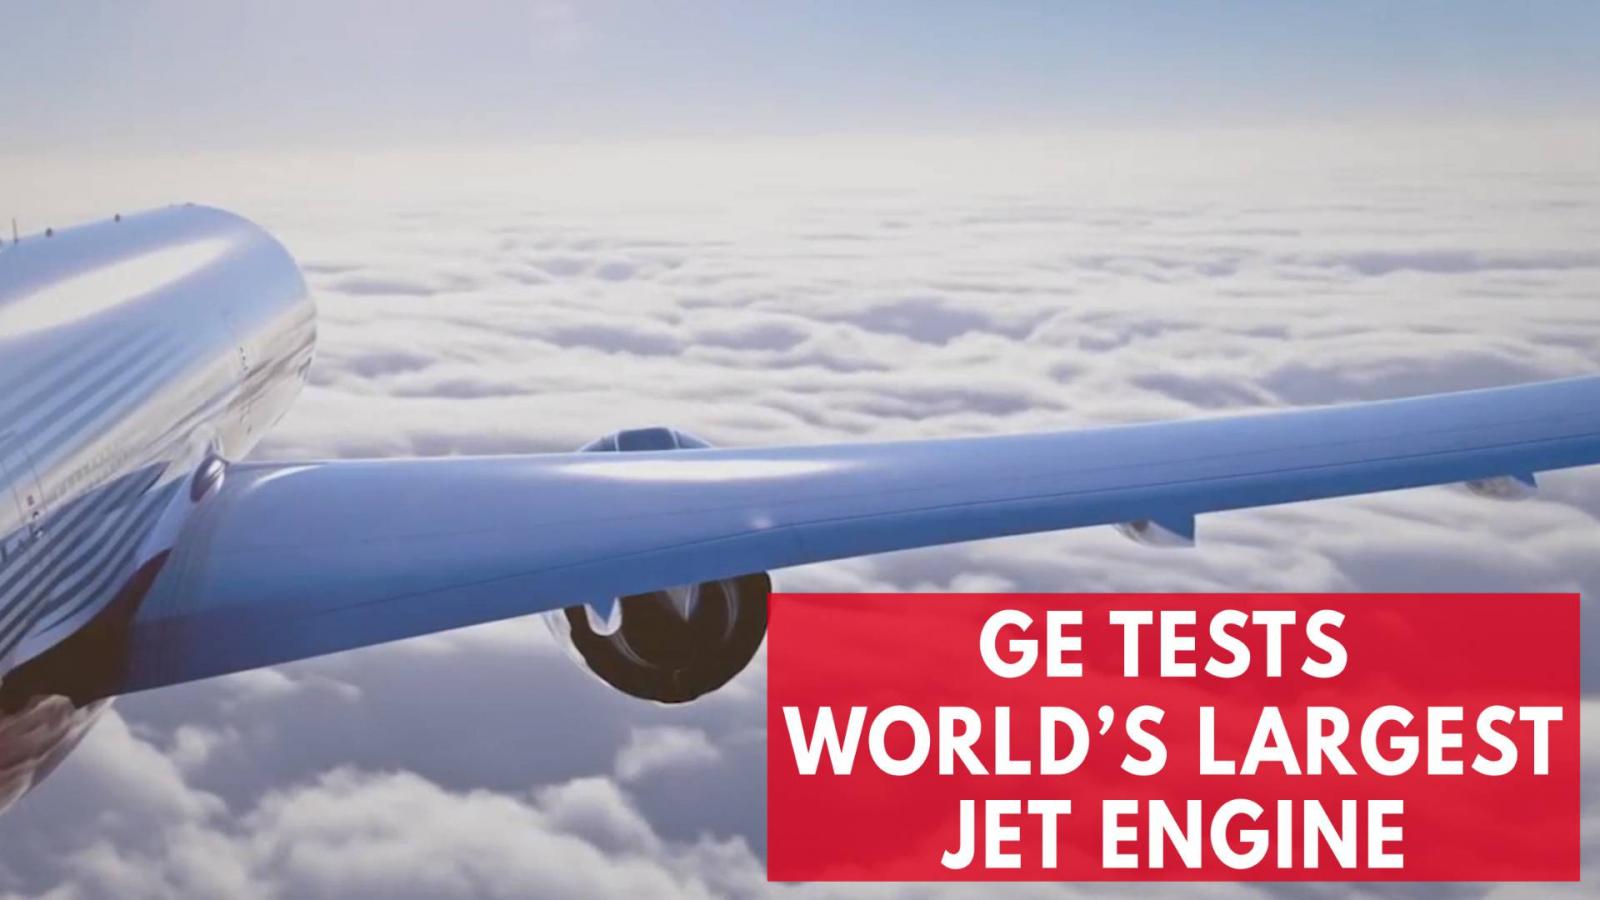 general-electric-starts-flight-trials-for-worlds-largest-jet-engine